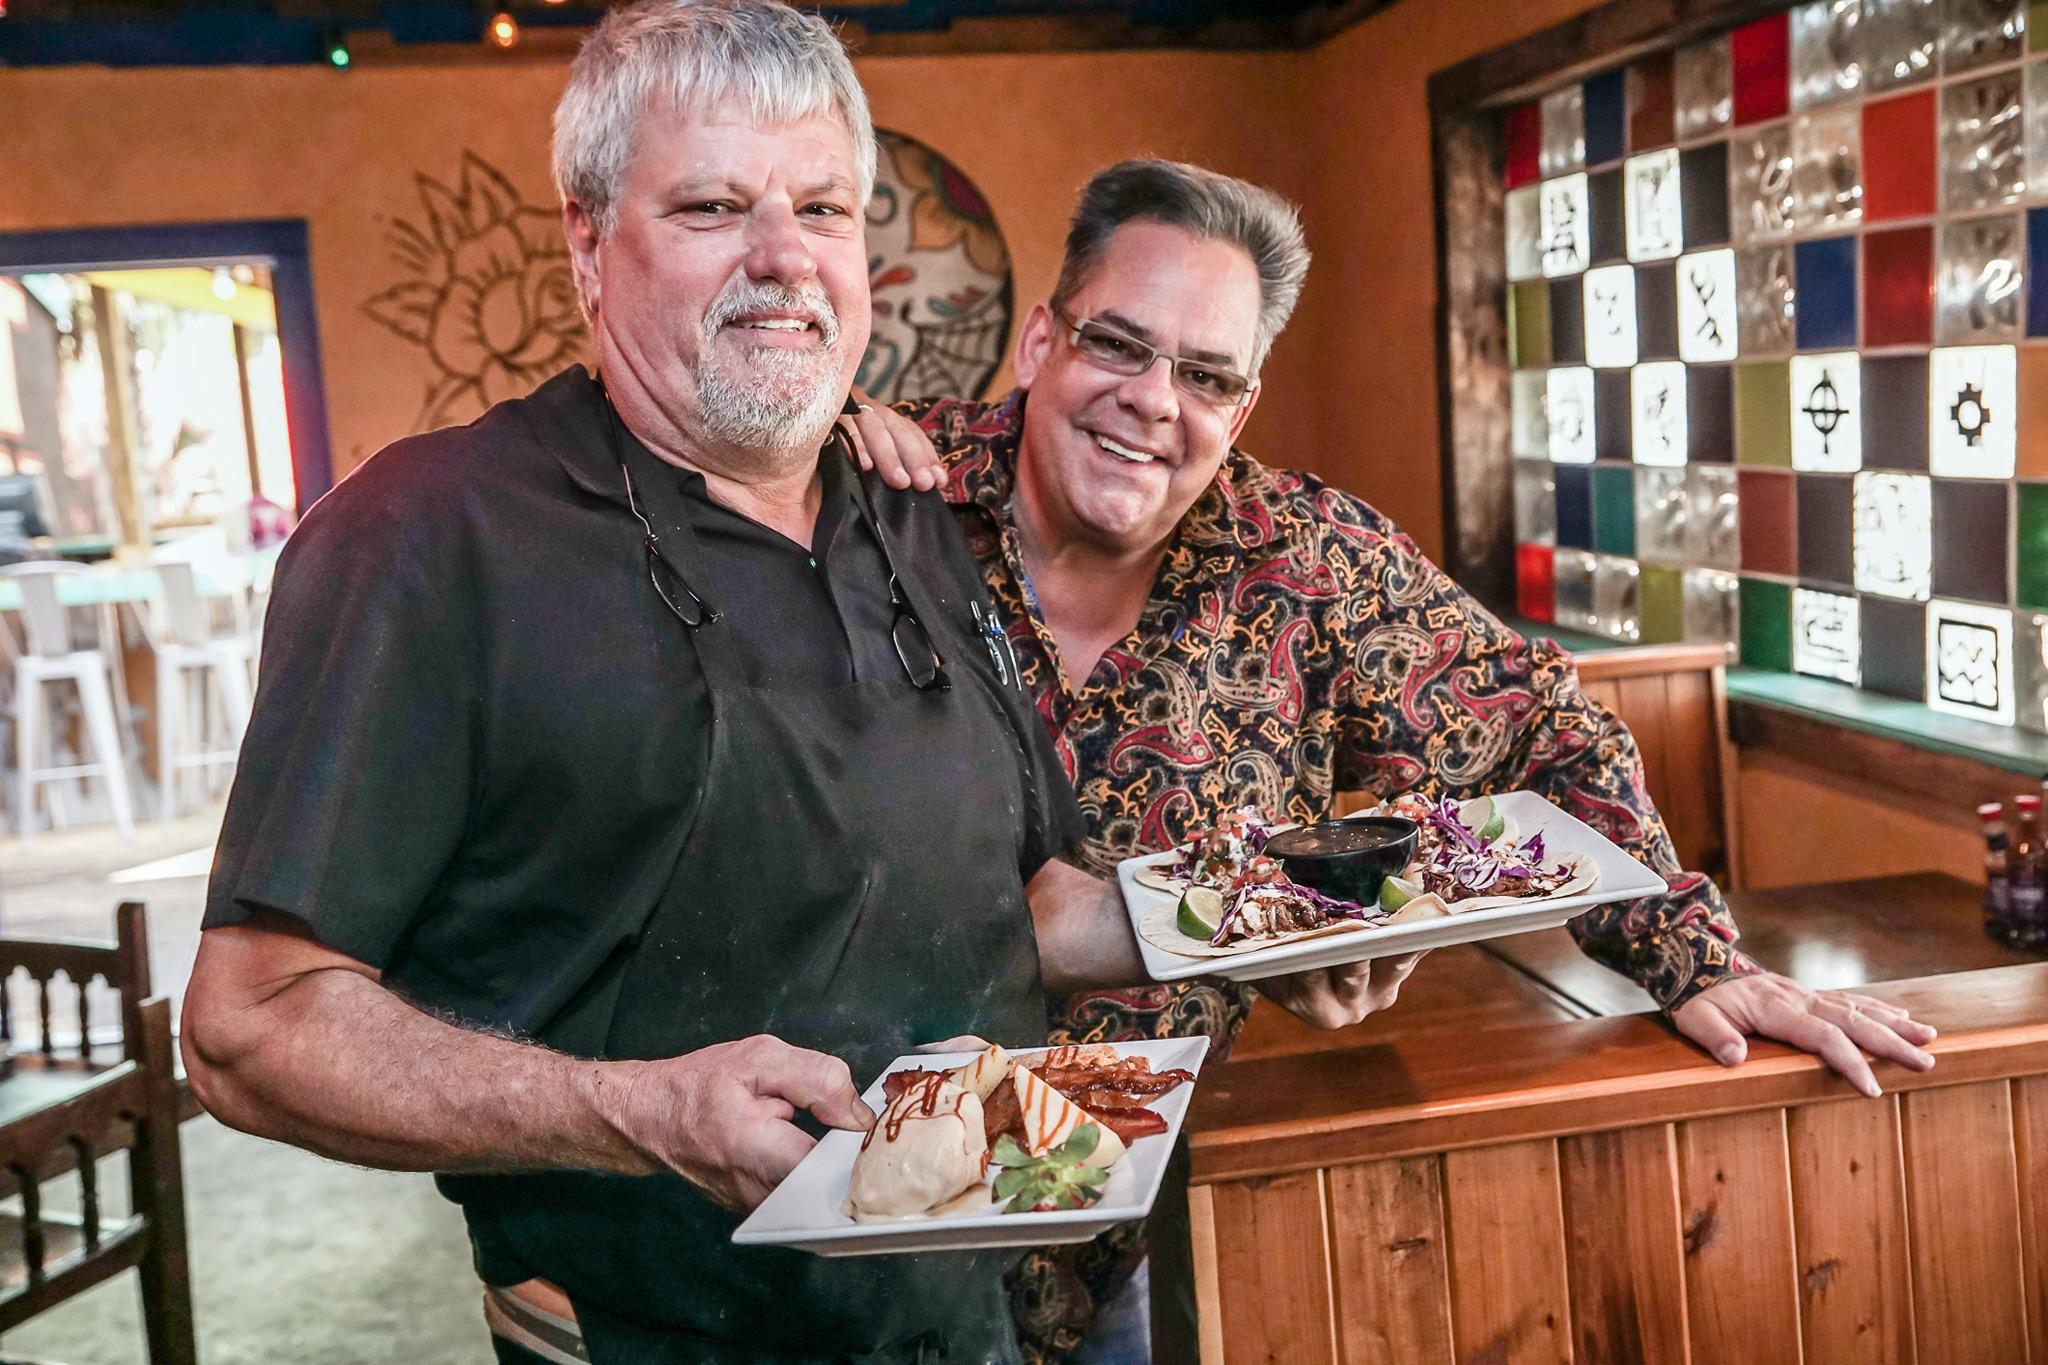 Executive Chef Paul Daubert and GM / Co-Owner Louie Spetrini